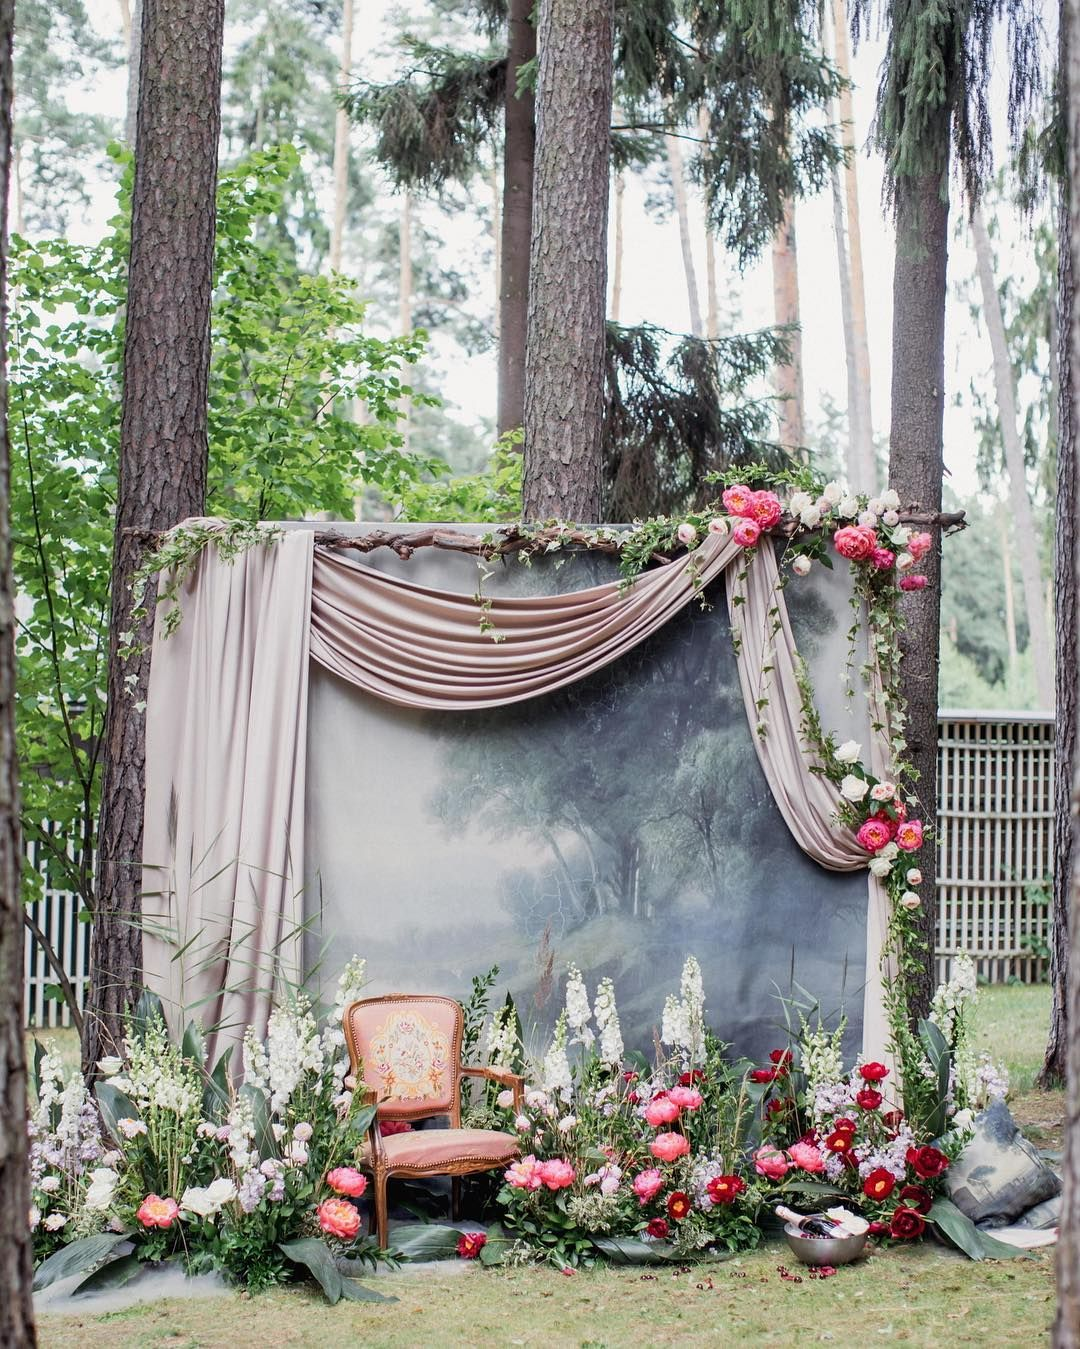 Outdoor Wedding Ceremony Whitby: Draped Ceremony Backdrop With Flowers #weddingceremony